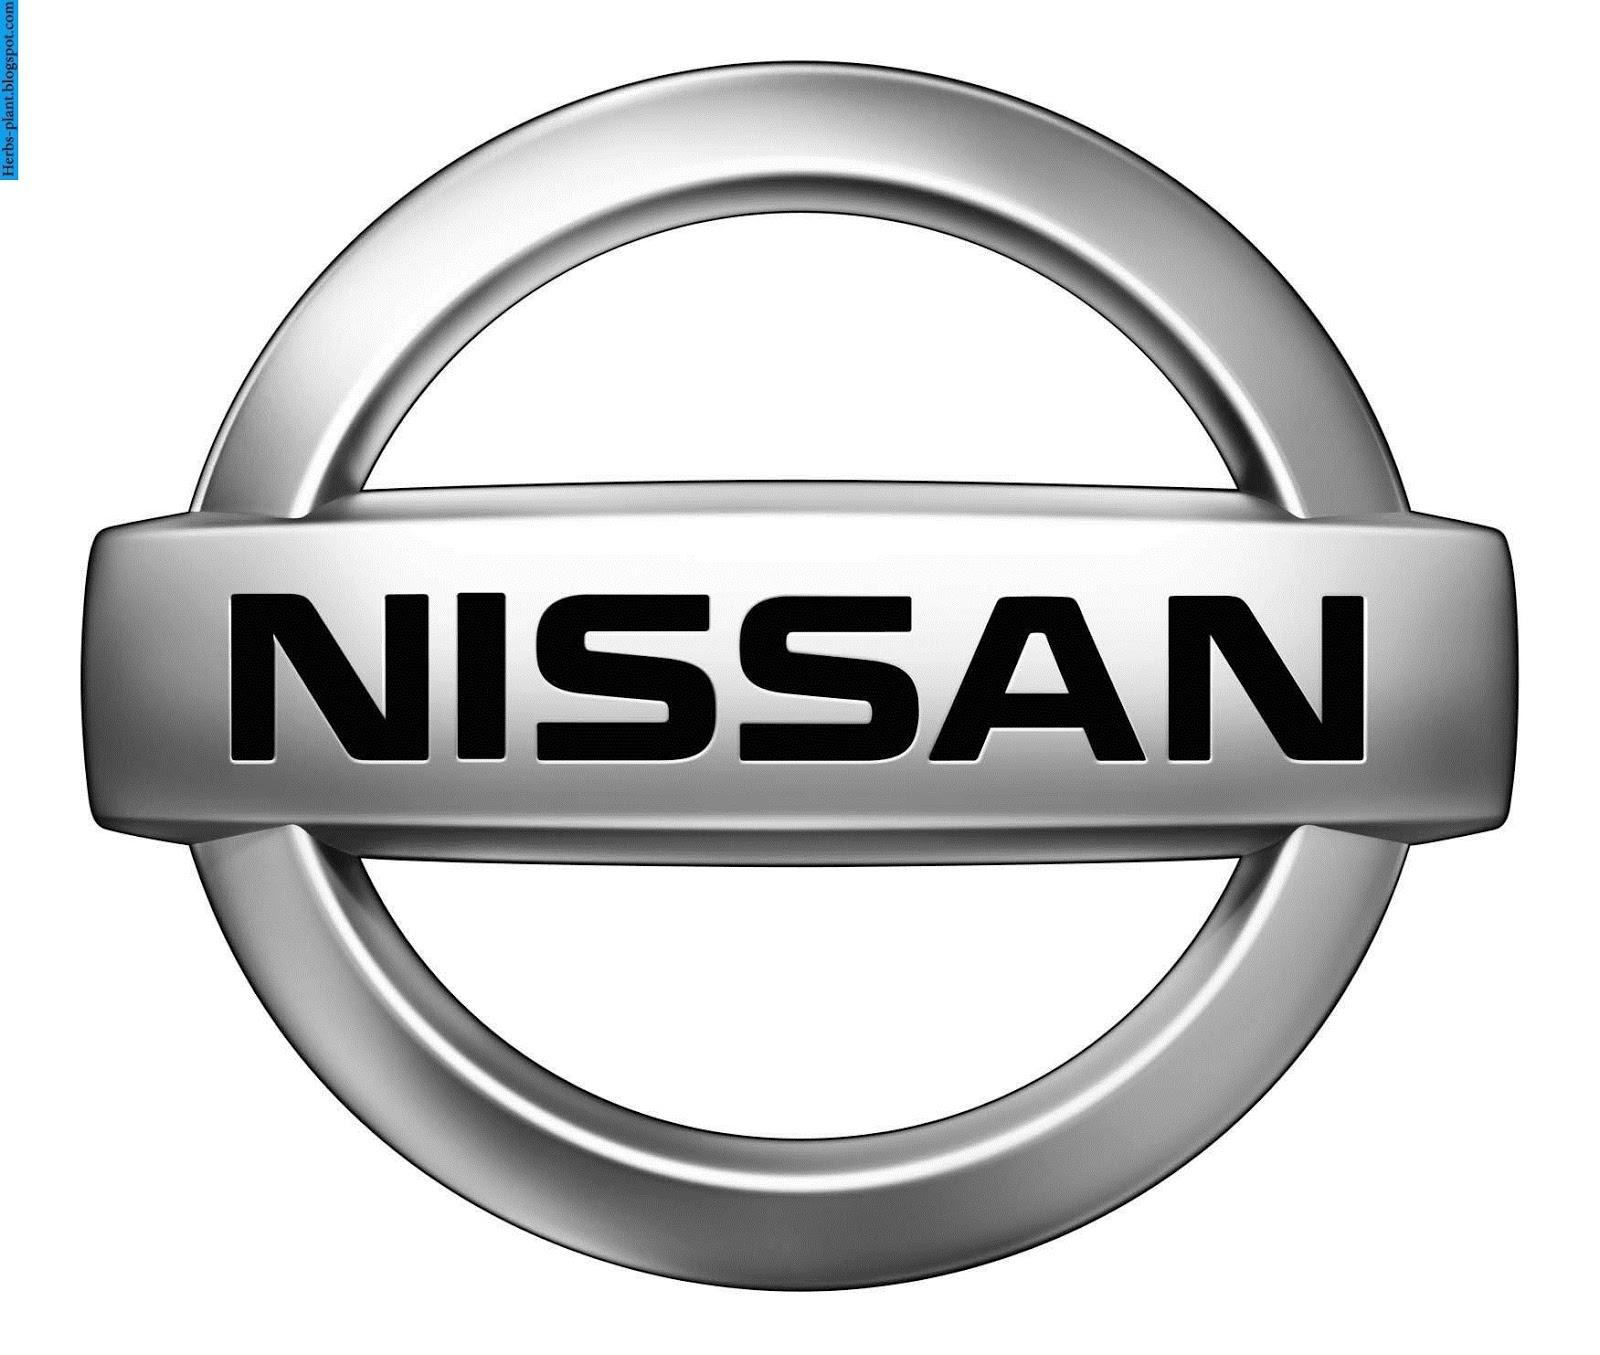 Nissan sunny car 2013 logo - صور شعار سيارة نيسان صنى 2013